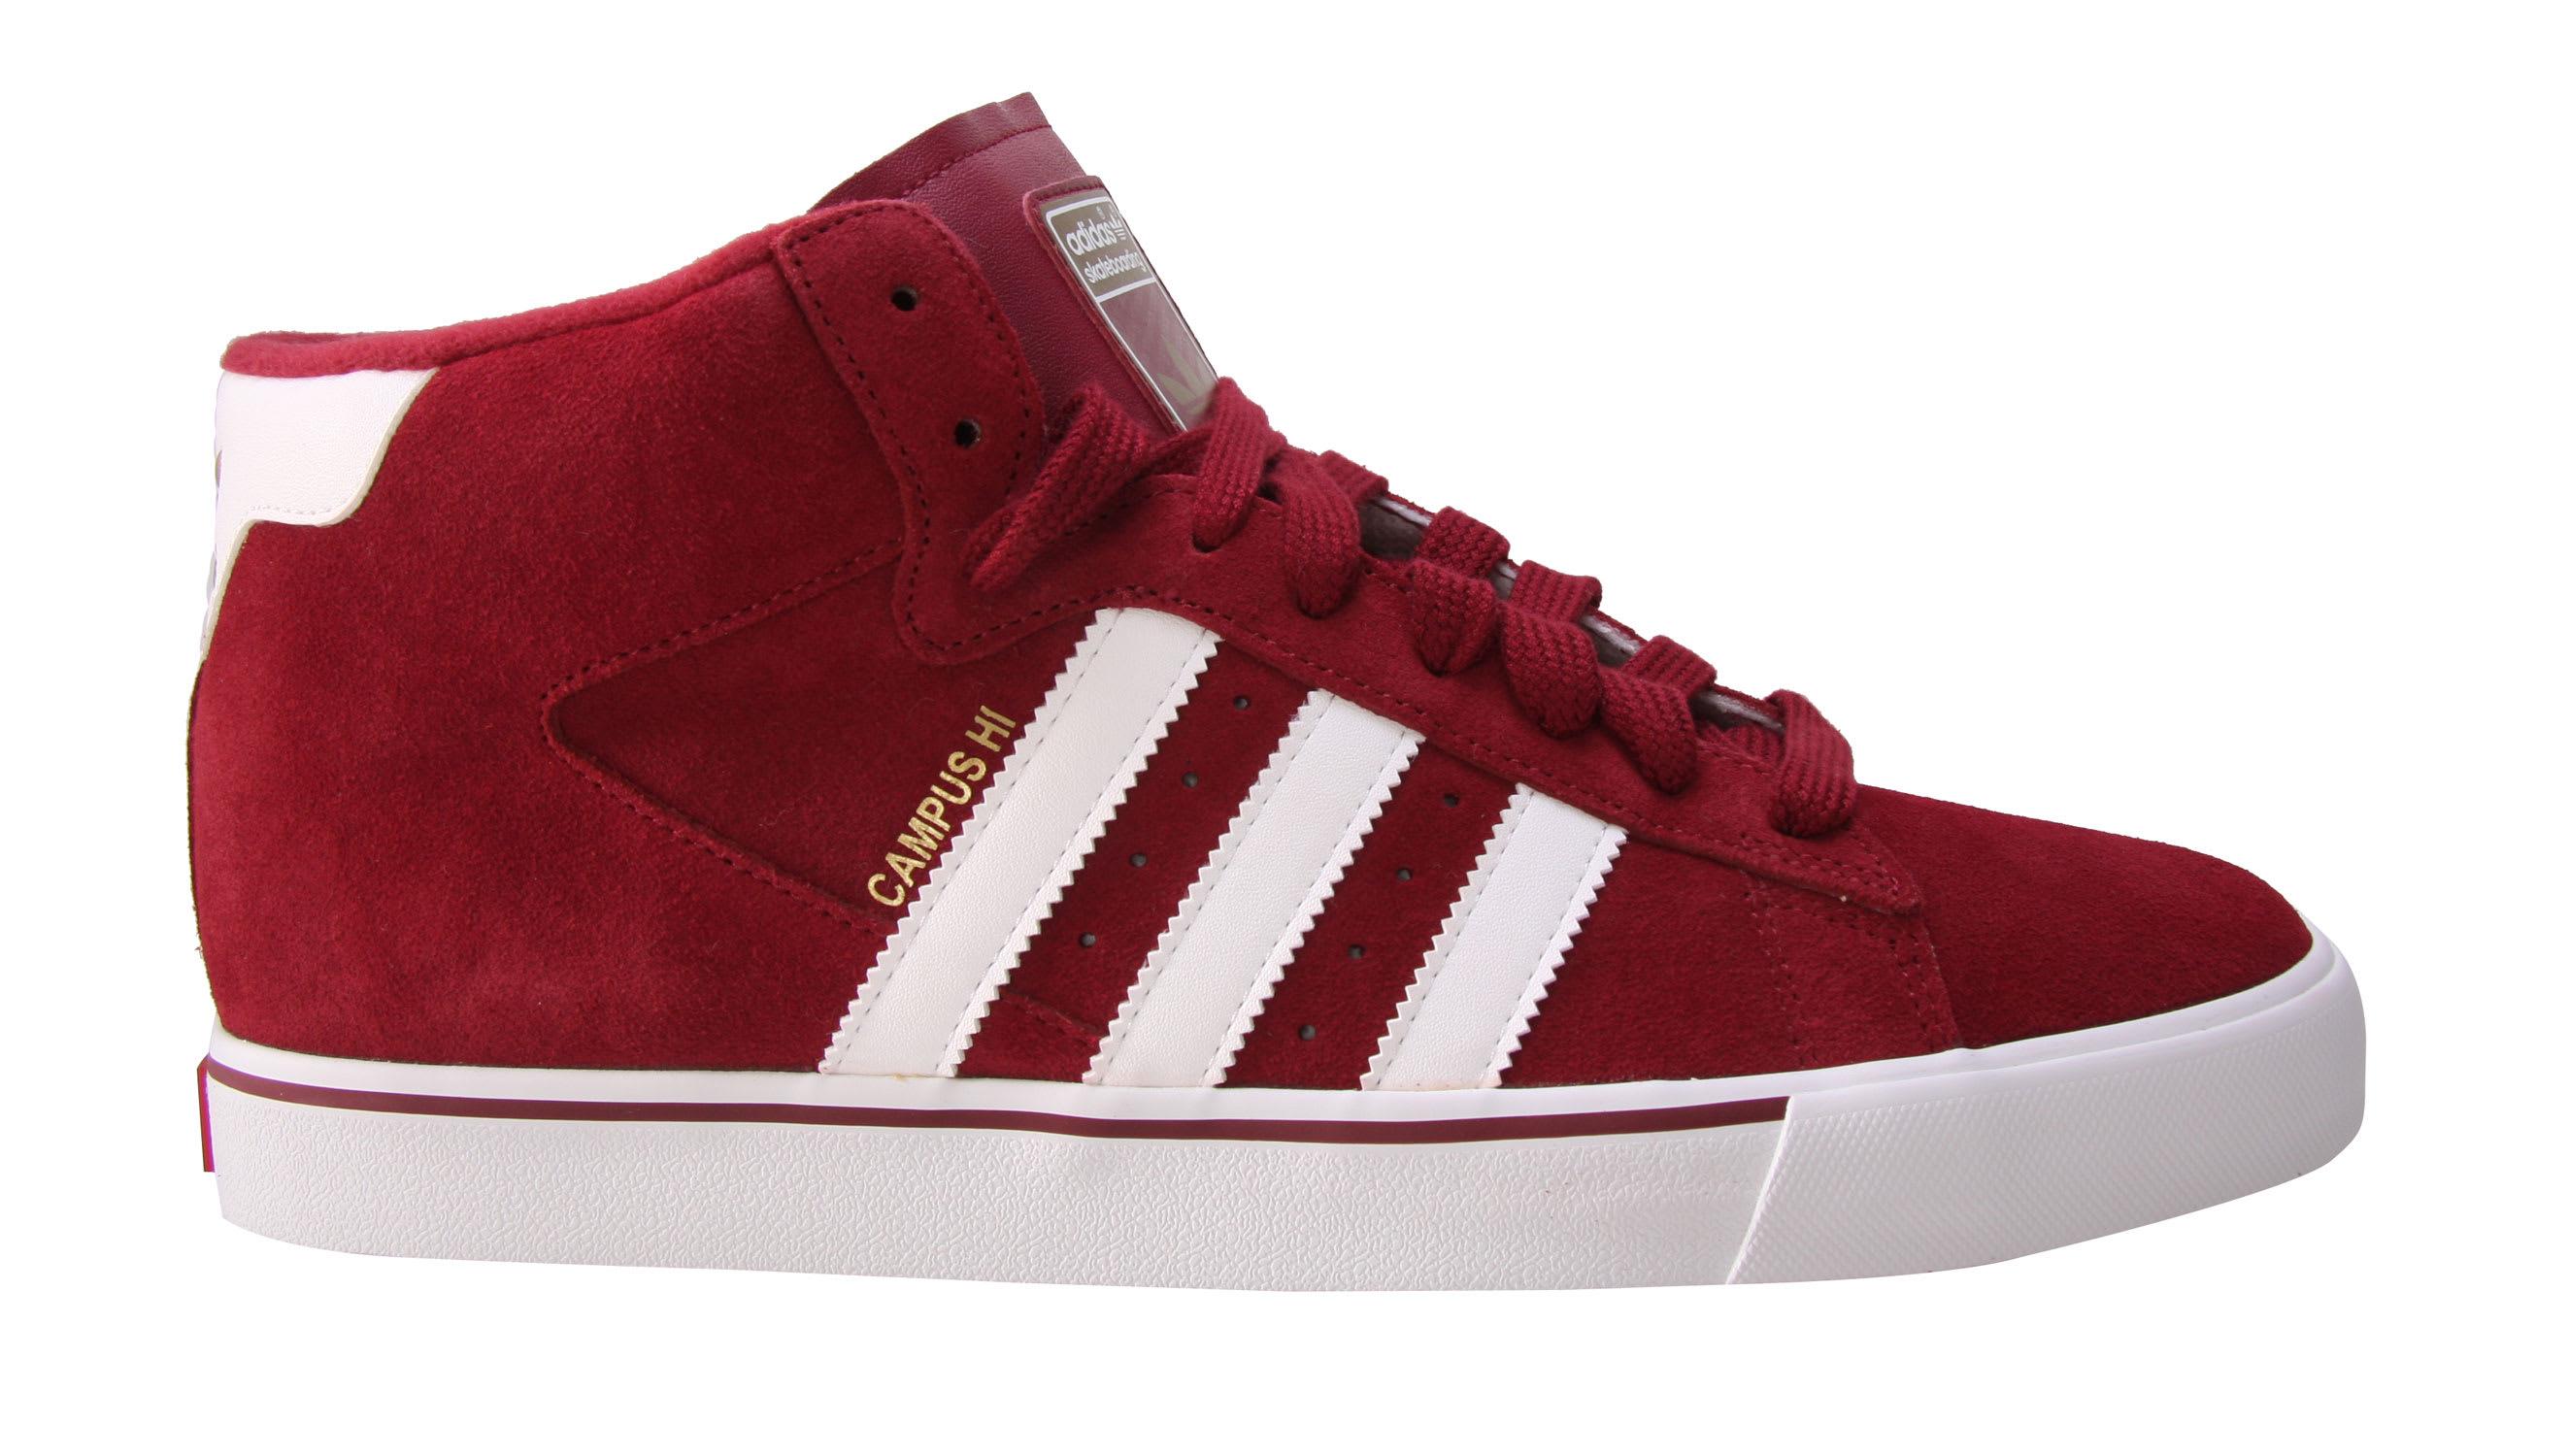 Adidas Campus Vulc Mid Skate Shoes - thumbnail 1 0b6fdf1892